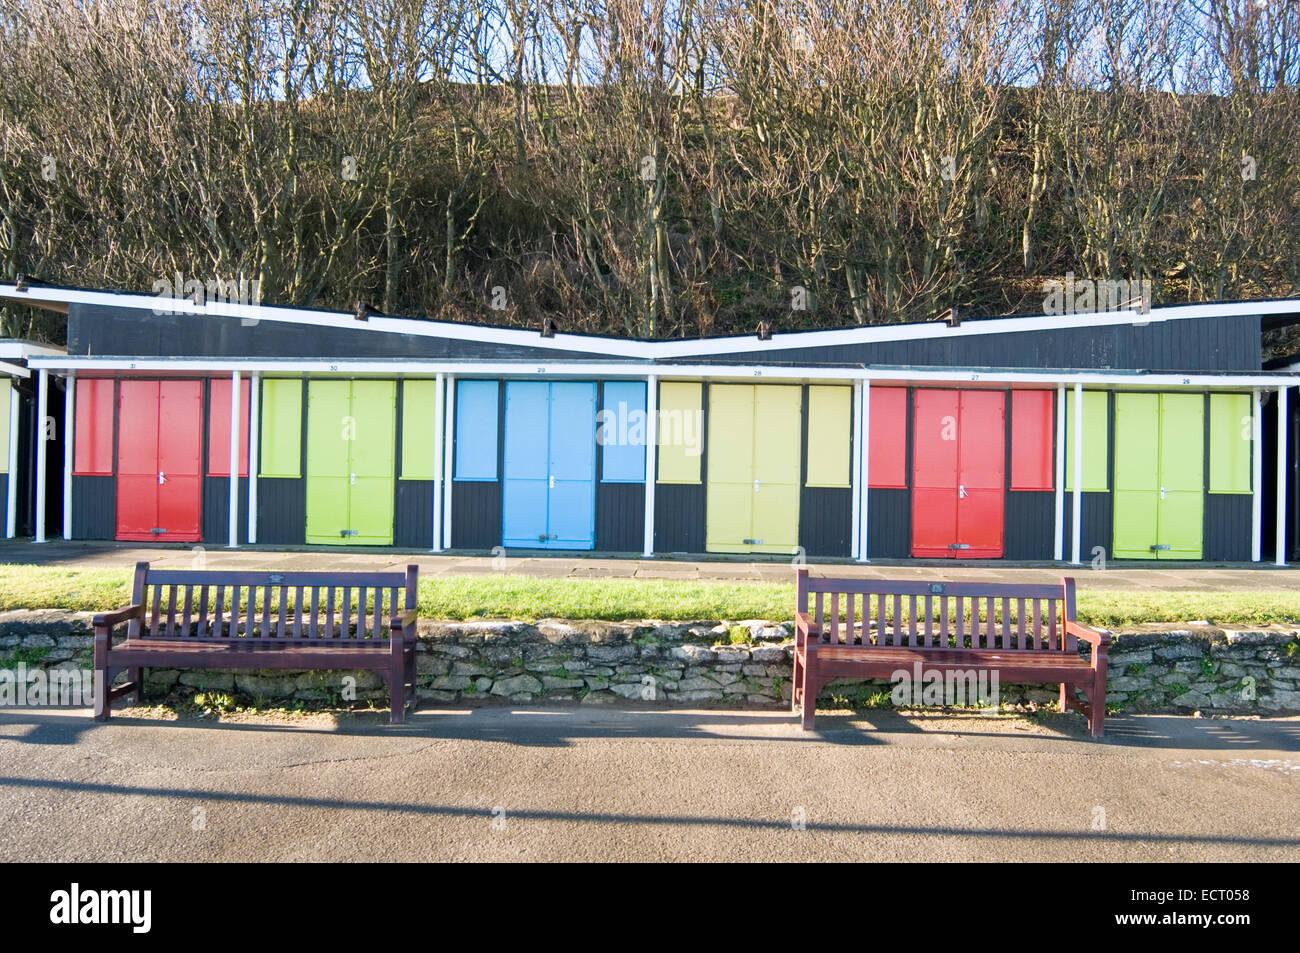 Stock Photo Beach Hut Huts Colour Color Door Doors Colored Coloured Paint Painted Bright Gaudy Exterior Wood Paints Wooden Door Doors Vivid